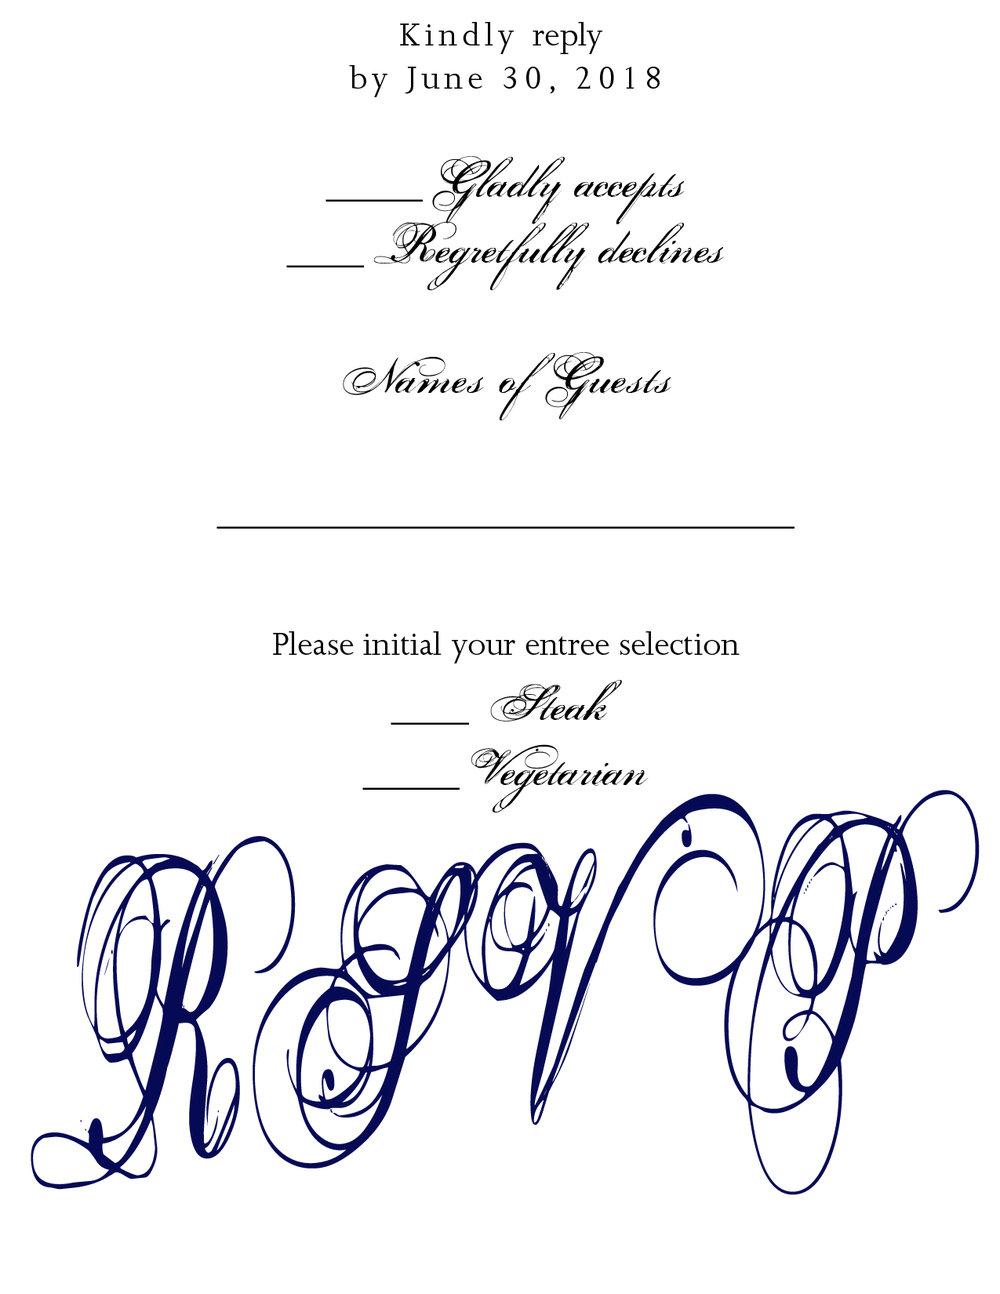 initial_invite copy.jpg